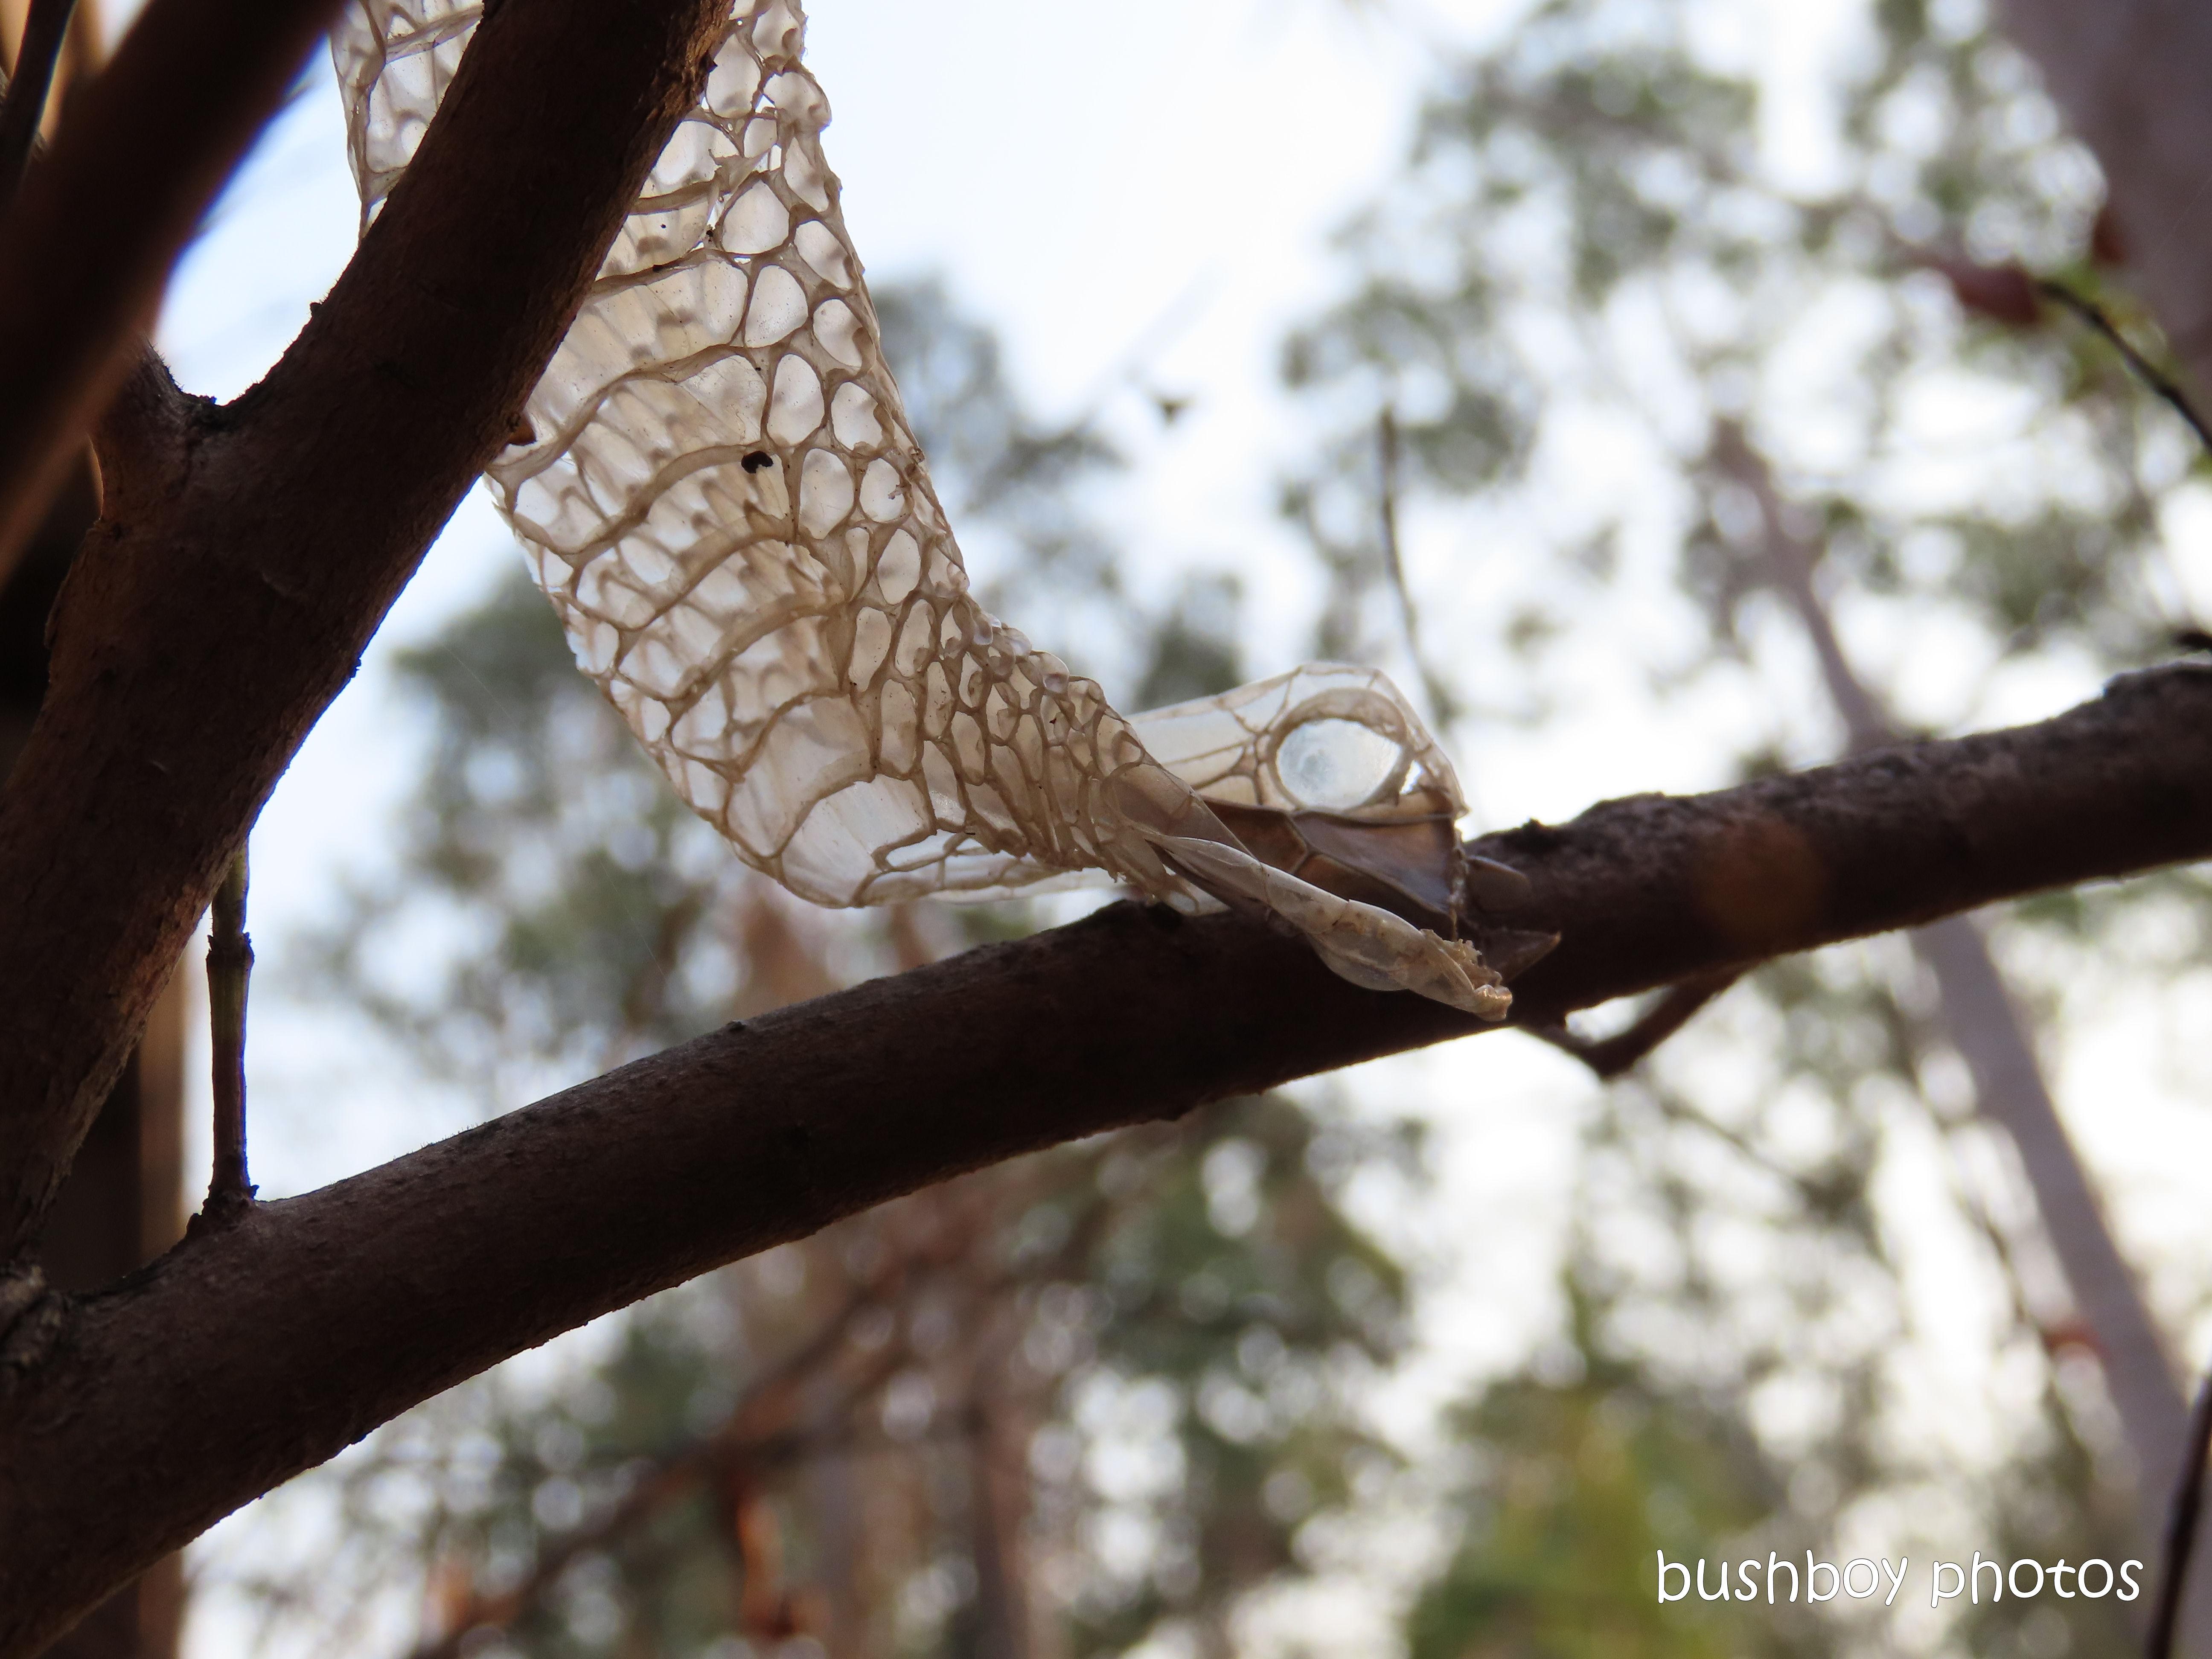 green_tree_snake_skin_head_named_home_jackadgery_nov 2019